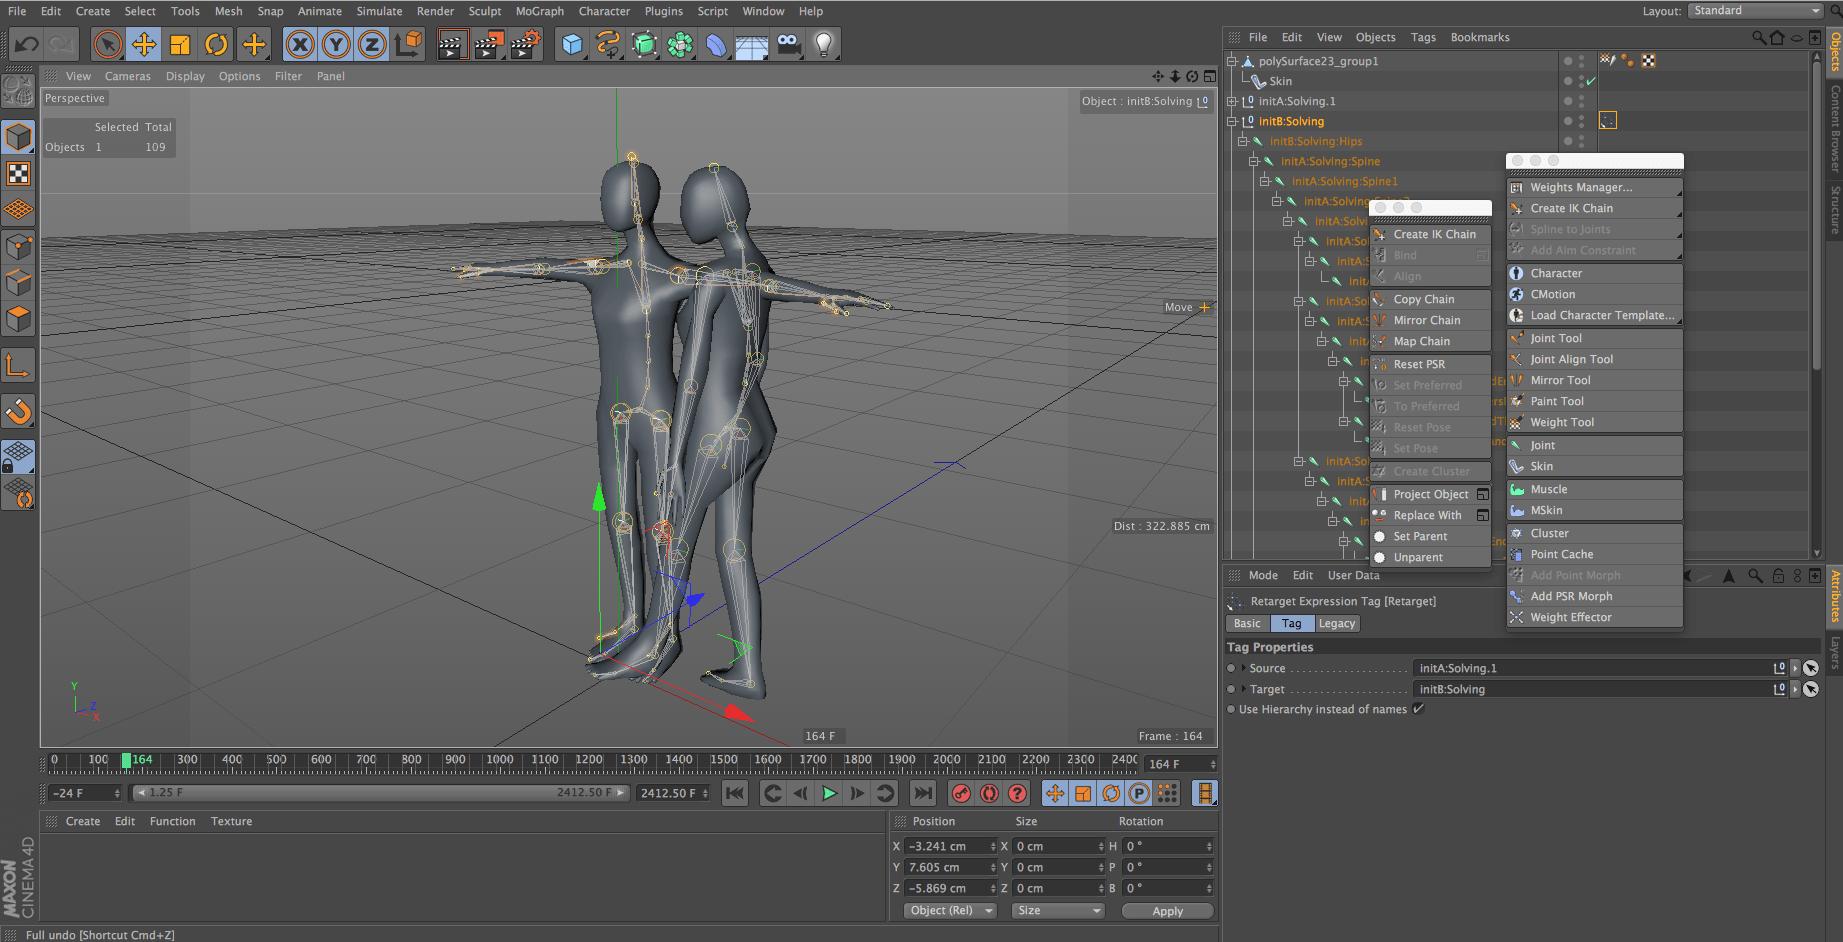 Screenshot 2015-11-25 03.07.55